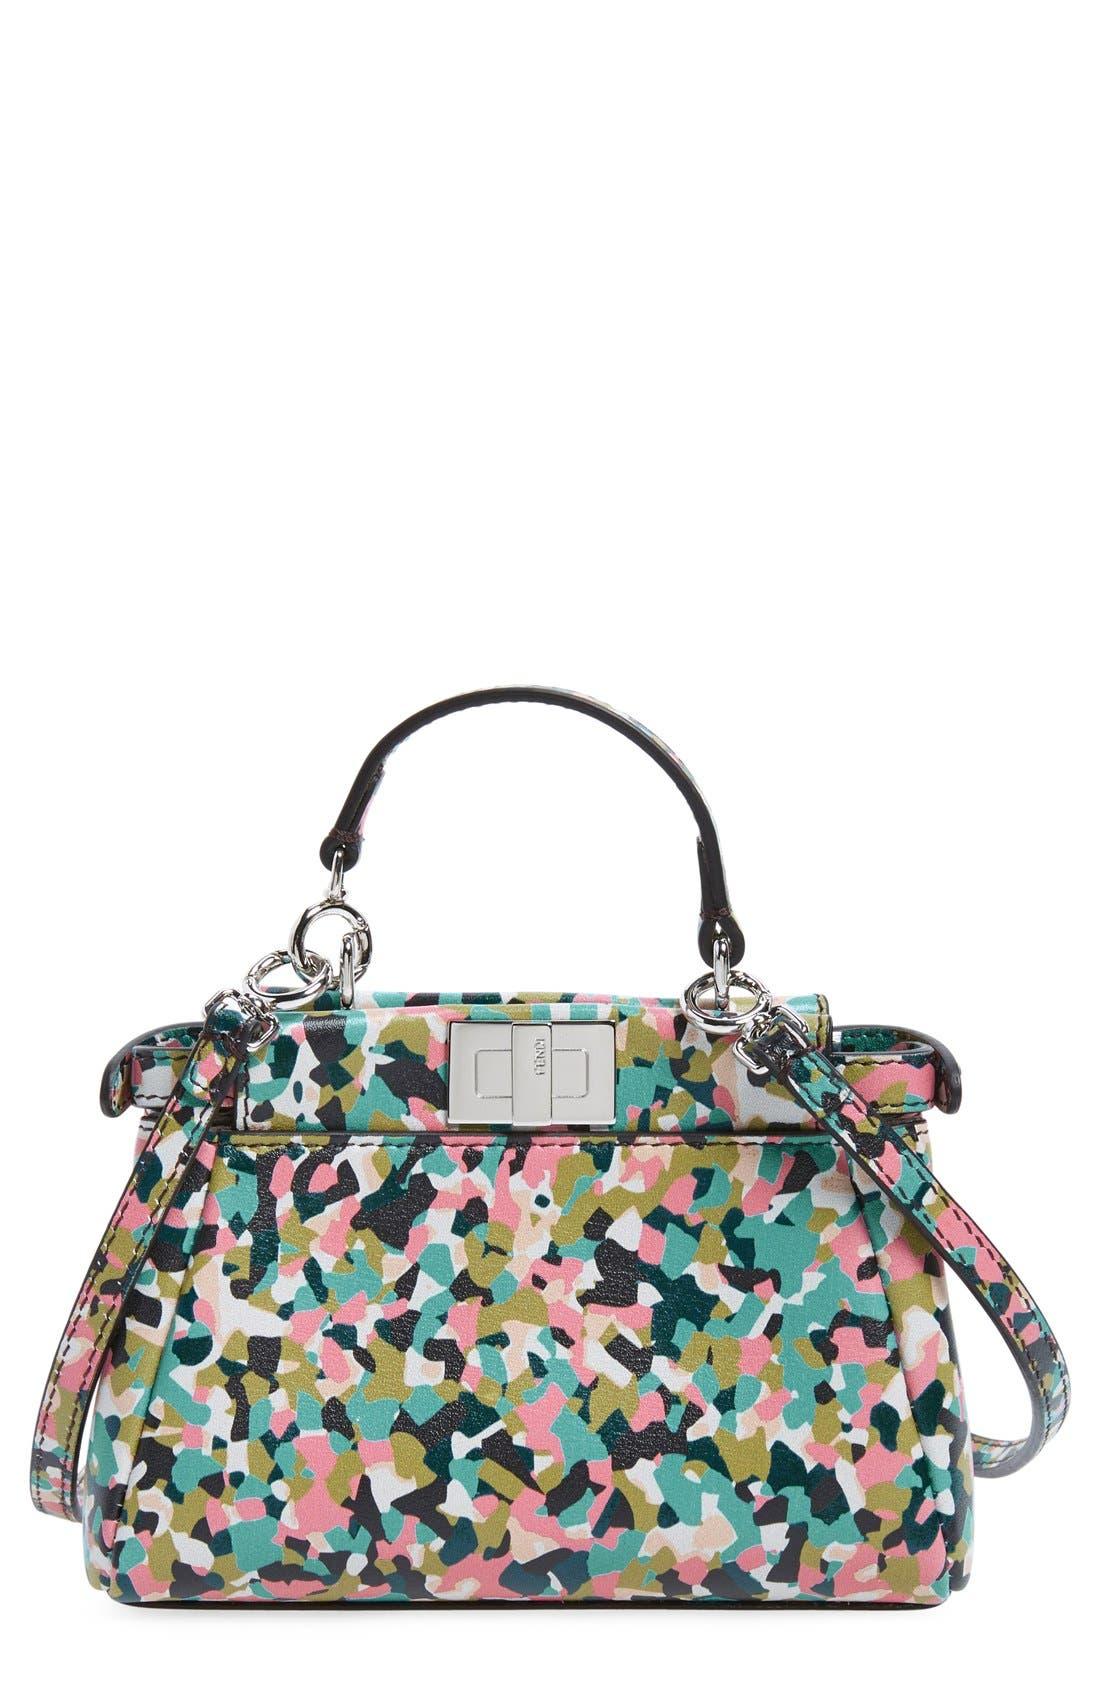 Fendi 'Micro Peekaboo - Granite' Leather Bag (Extra Small)